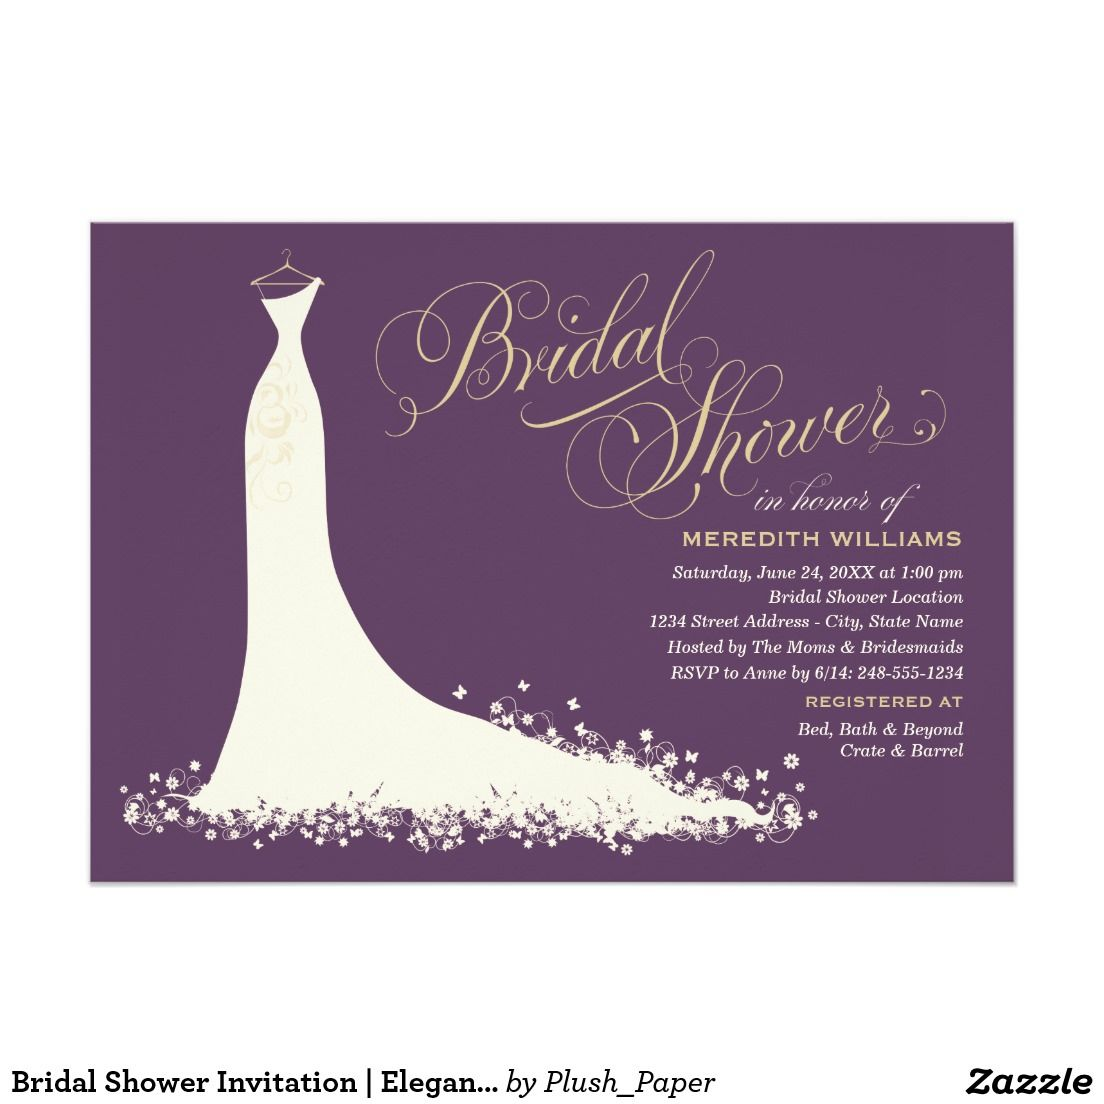 wedding shower invitation samples   elegant wedding gowns, shower